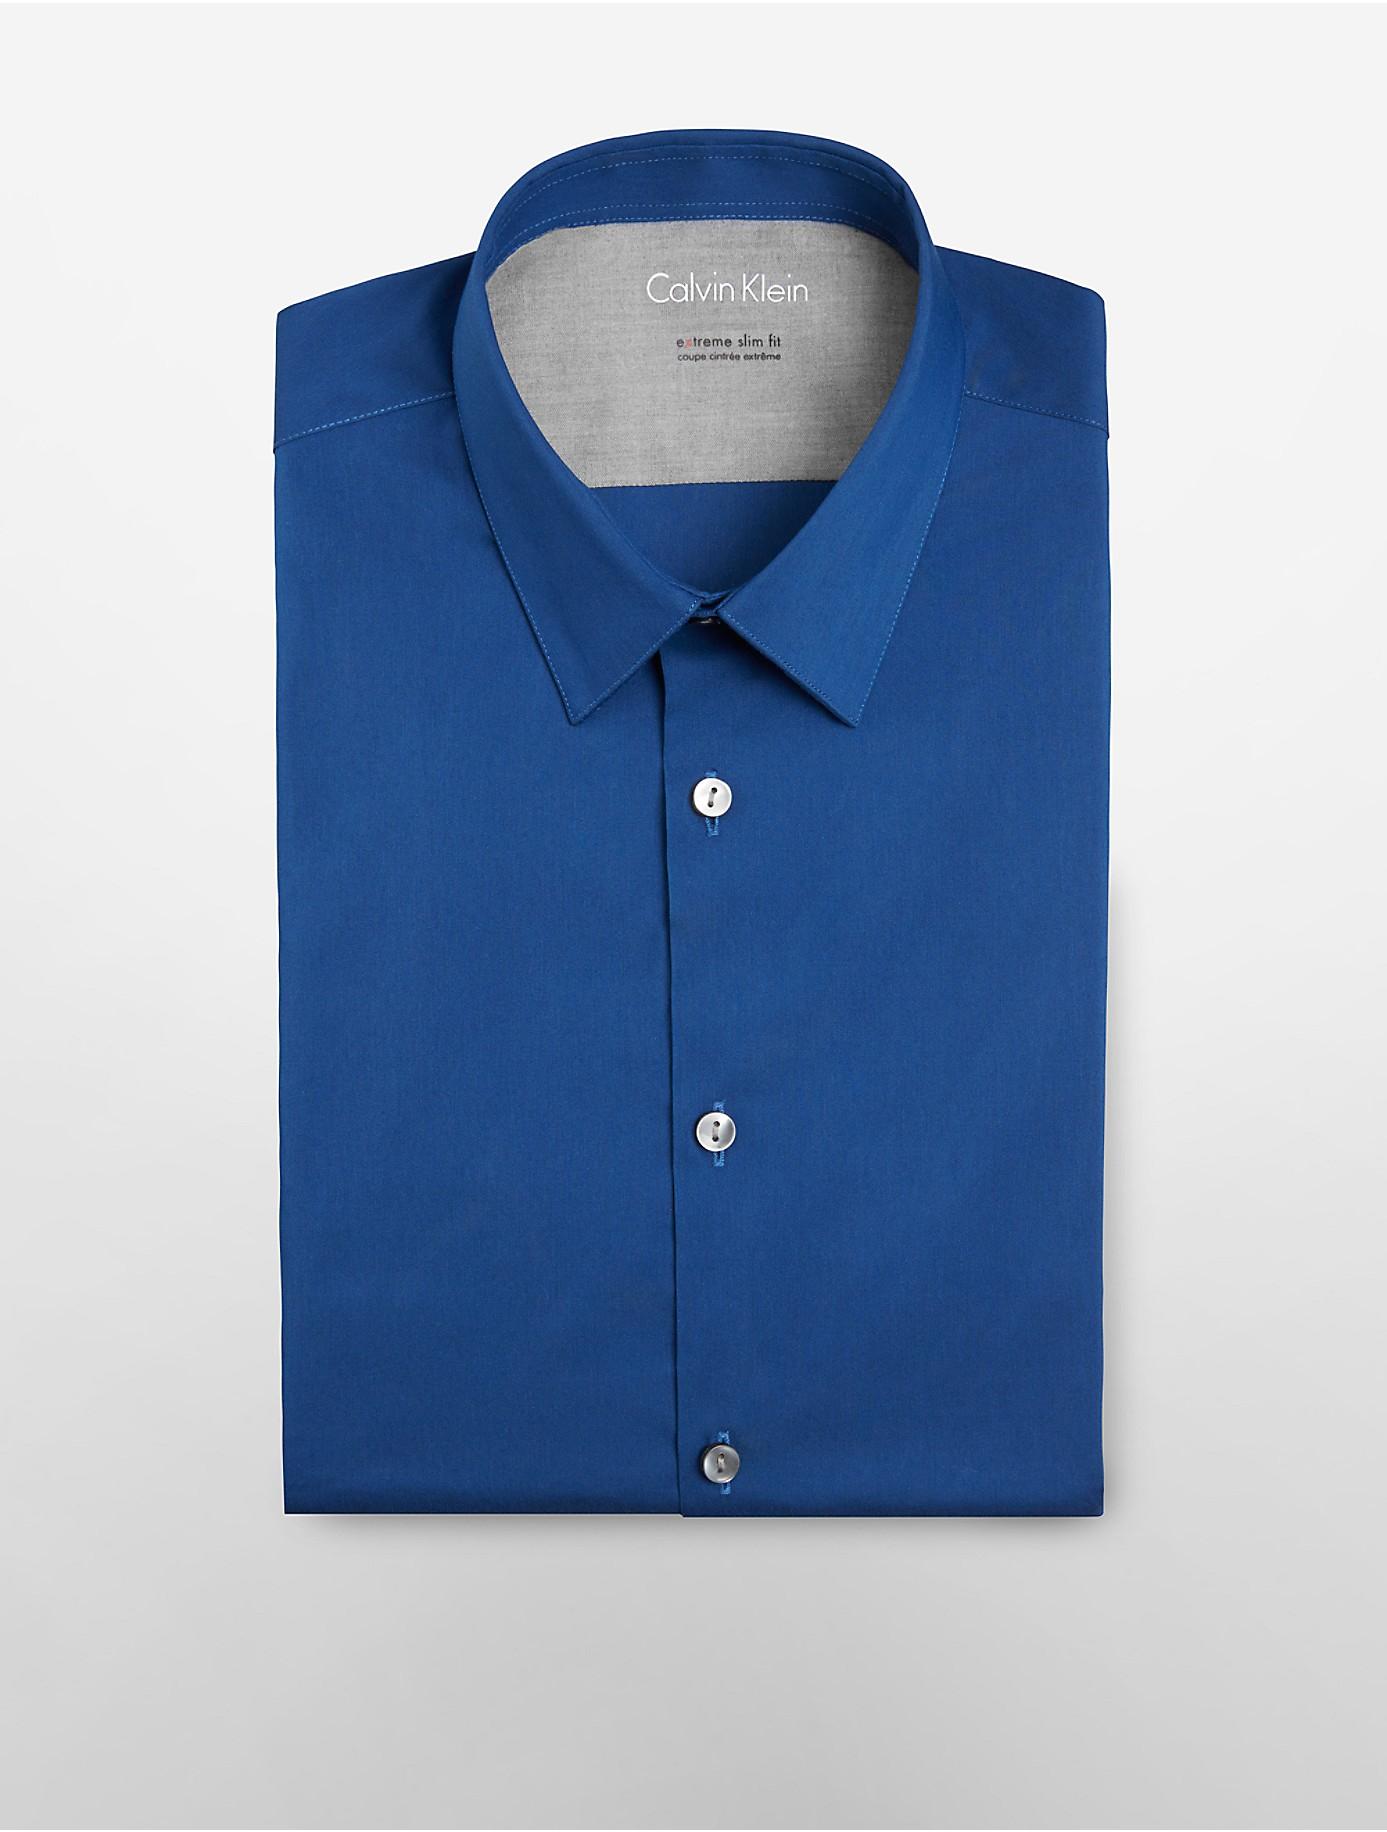 Calvin klein white label x fit ultra slim fit solid dress for Calvin klein x fit dress shirt